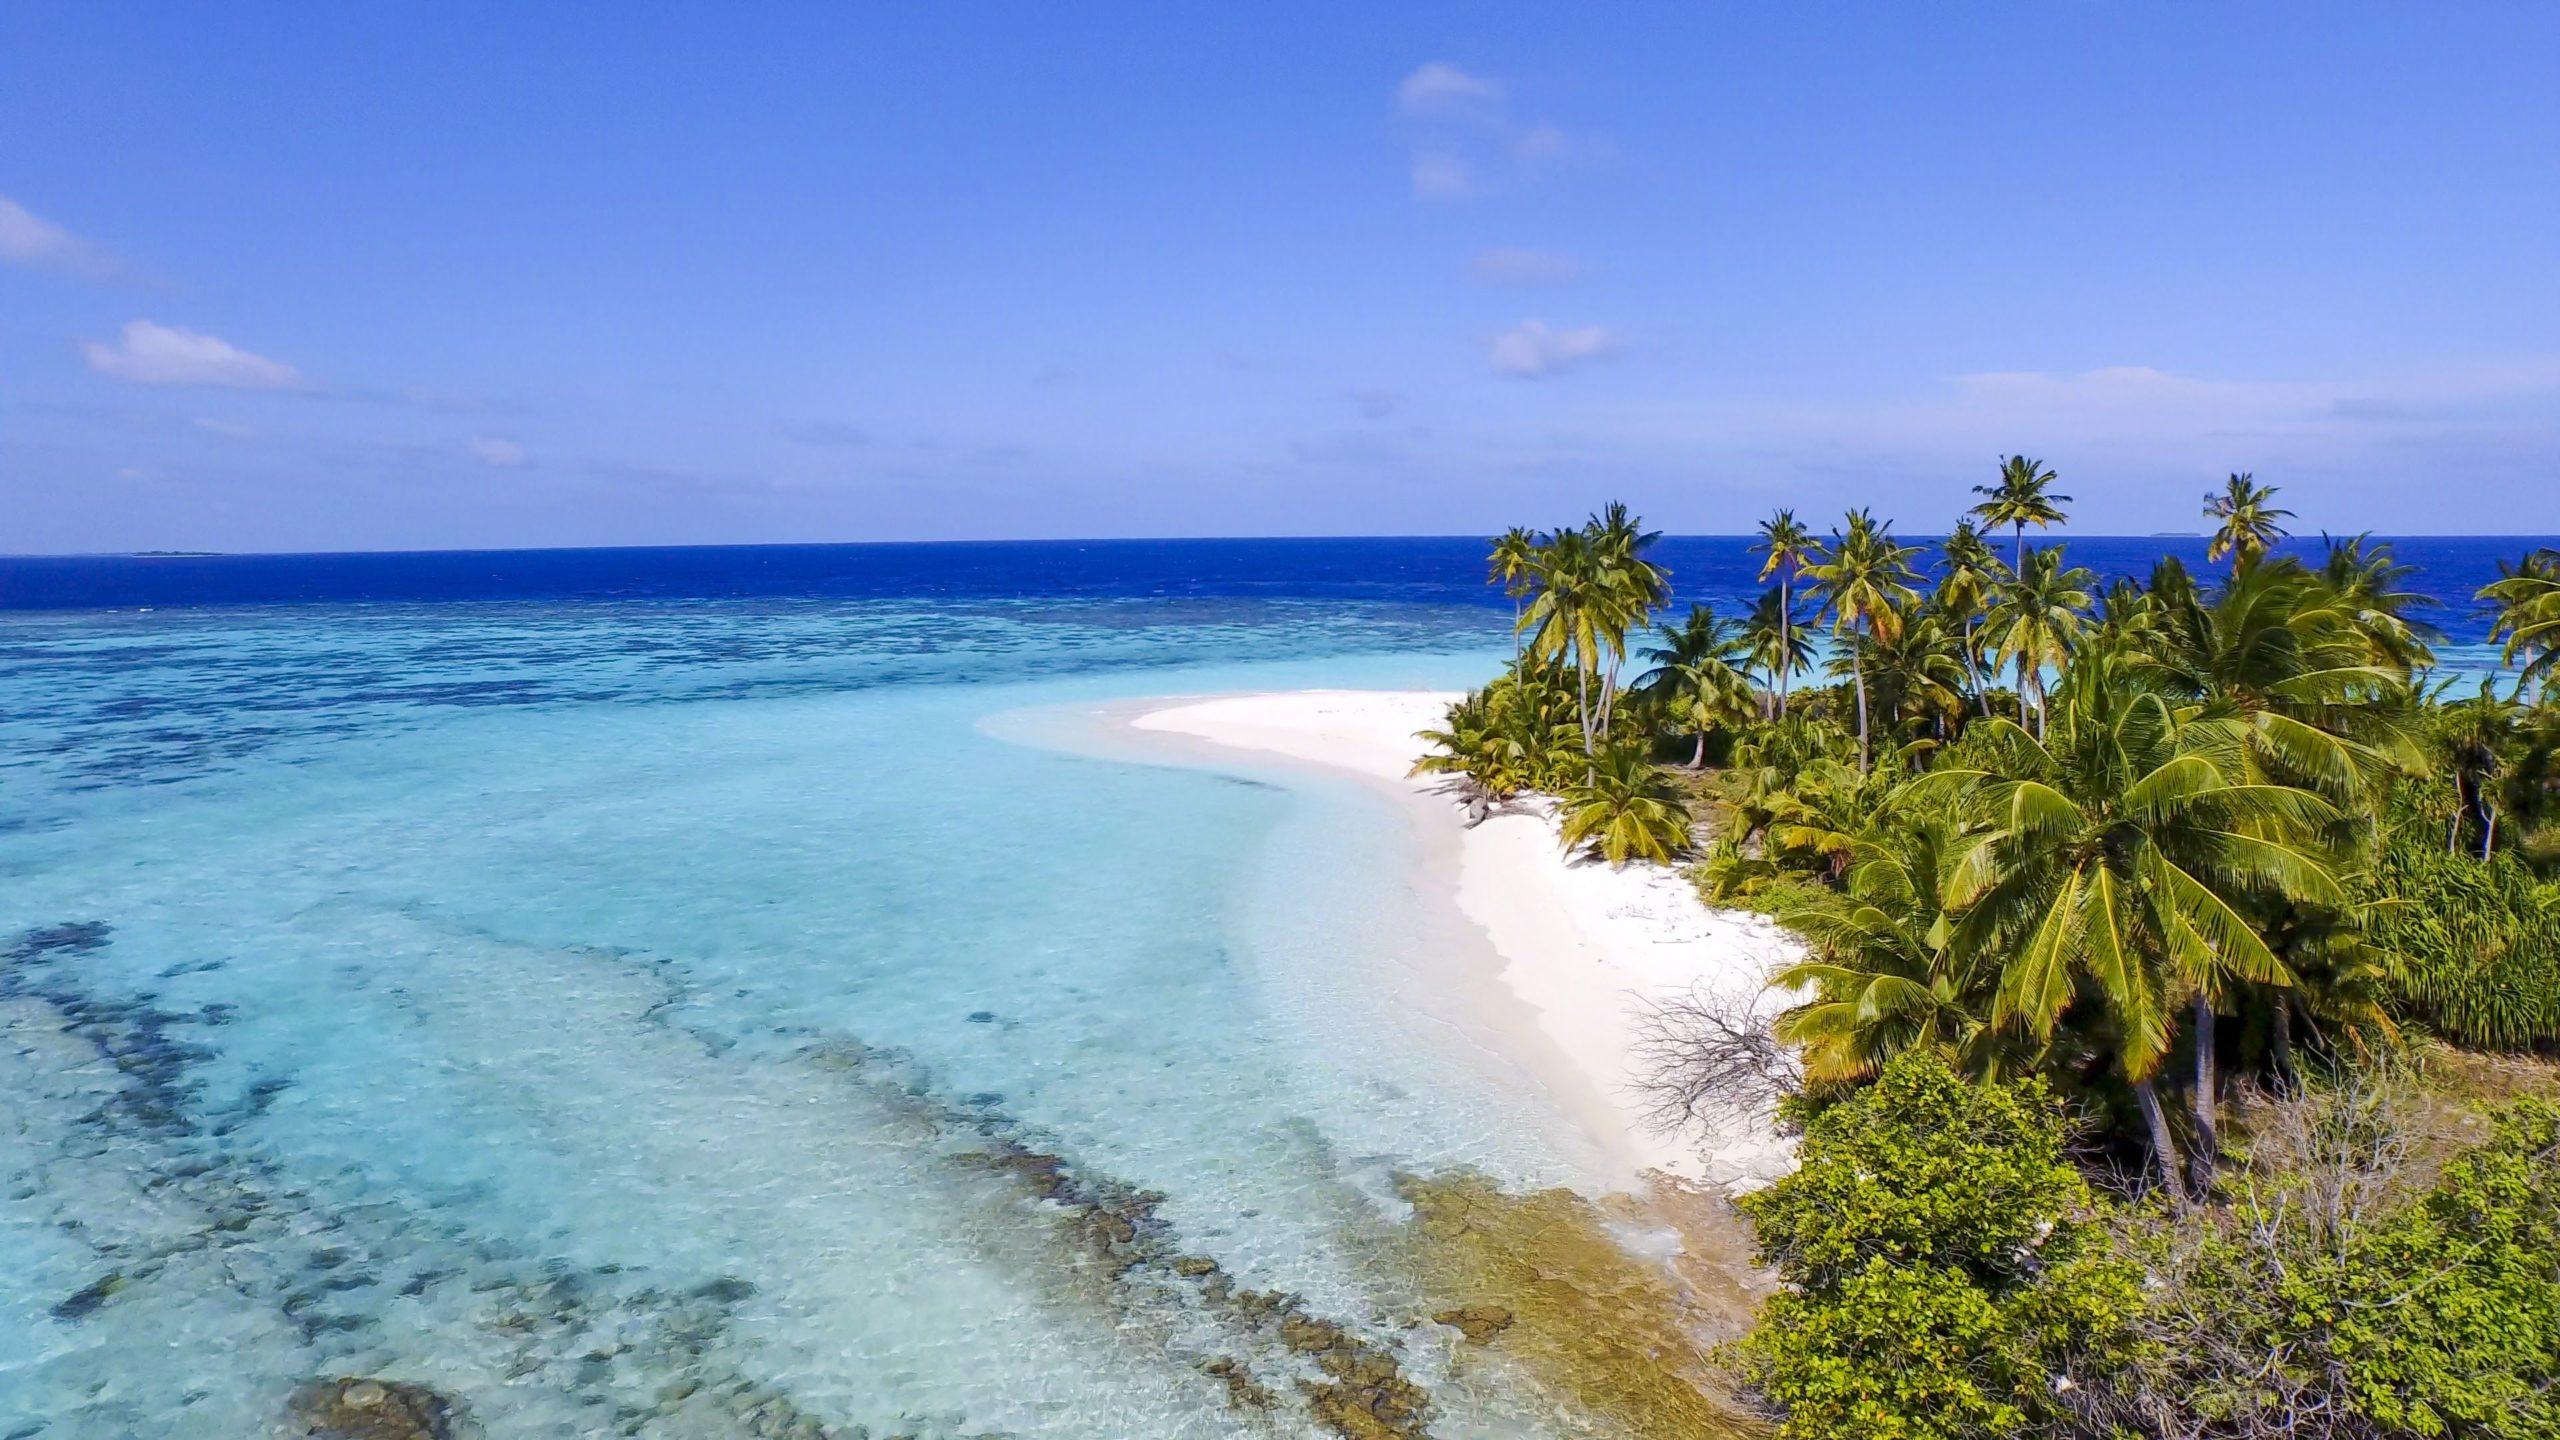 Maldives Border Miles